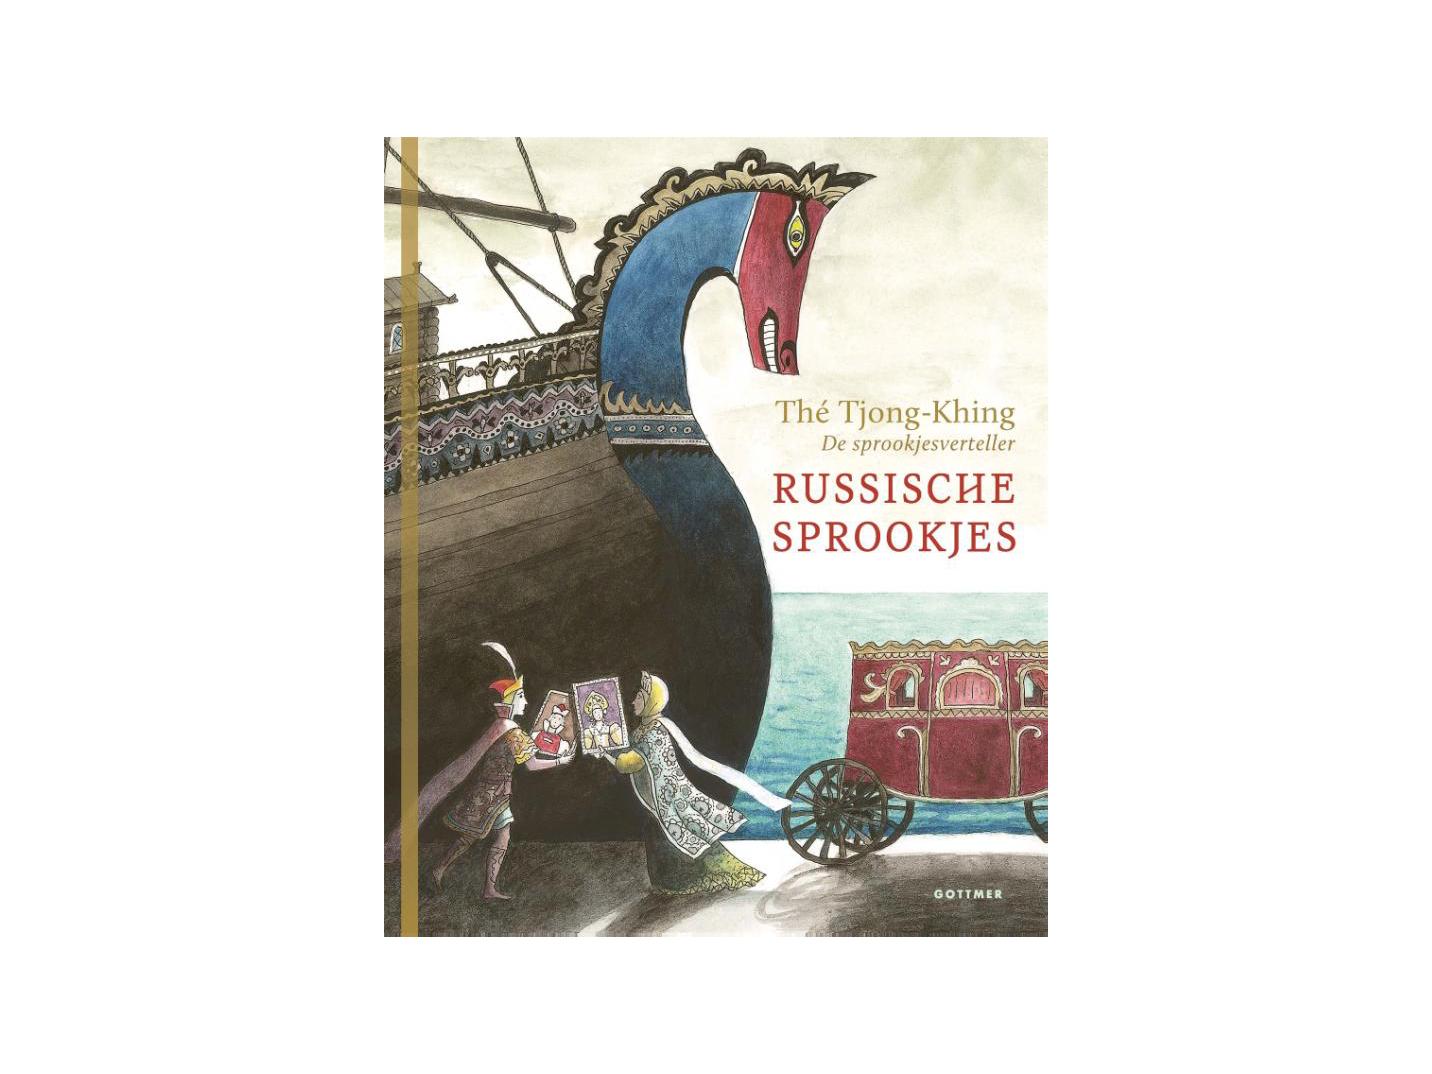 Russische sprookjes The Tjong Khing